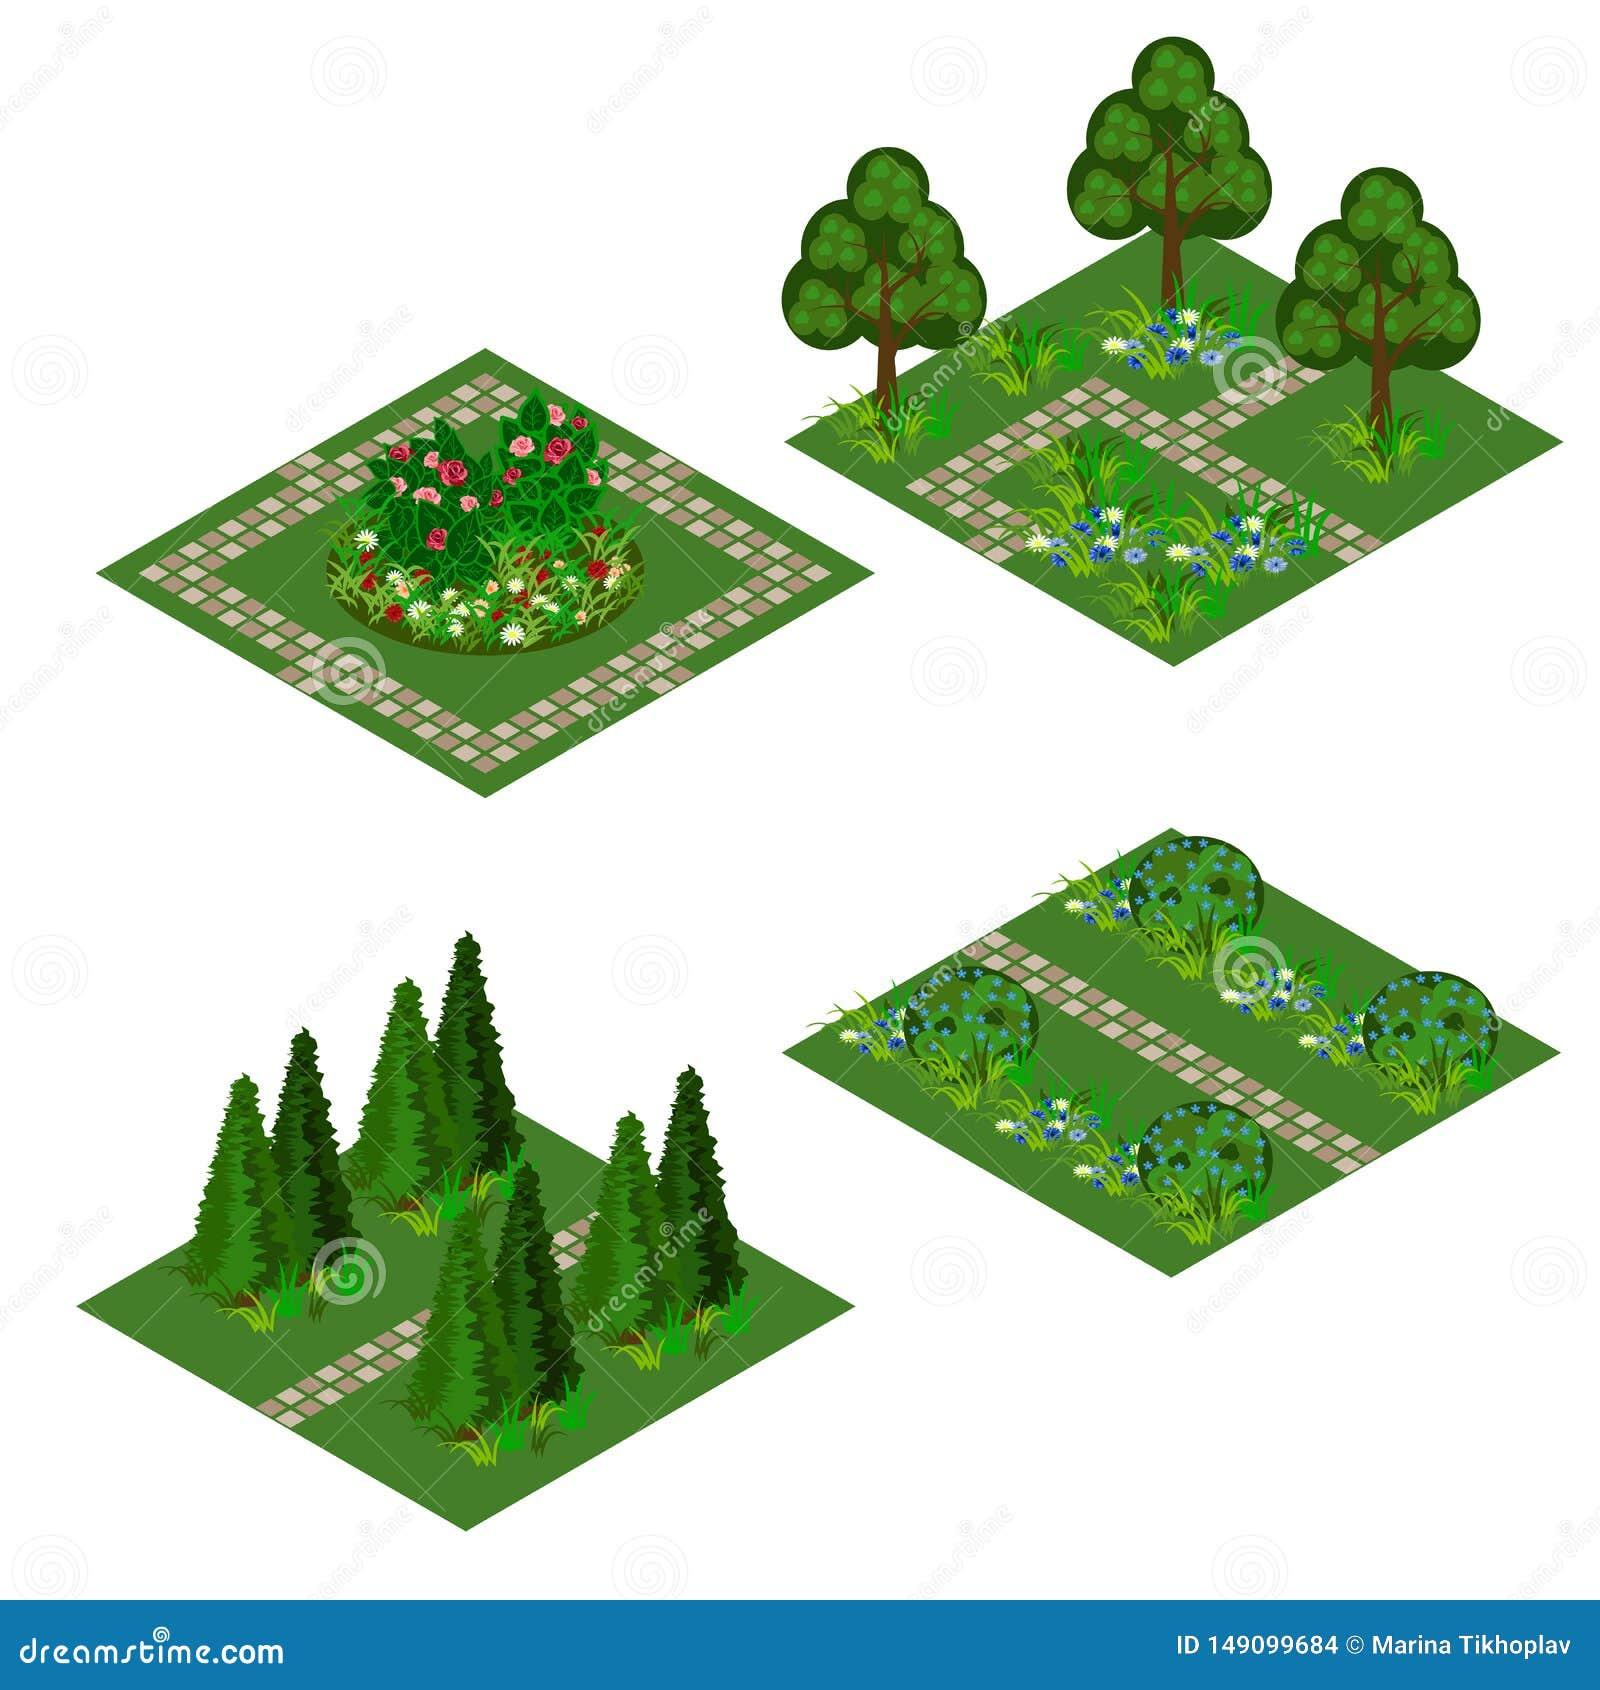 Garden isometric asset for design landscape in game or cartoon